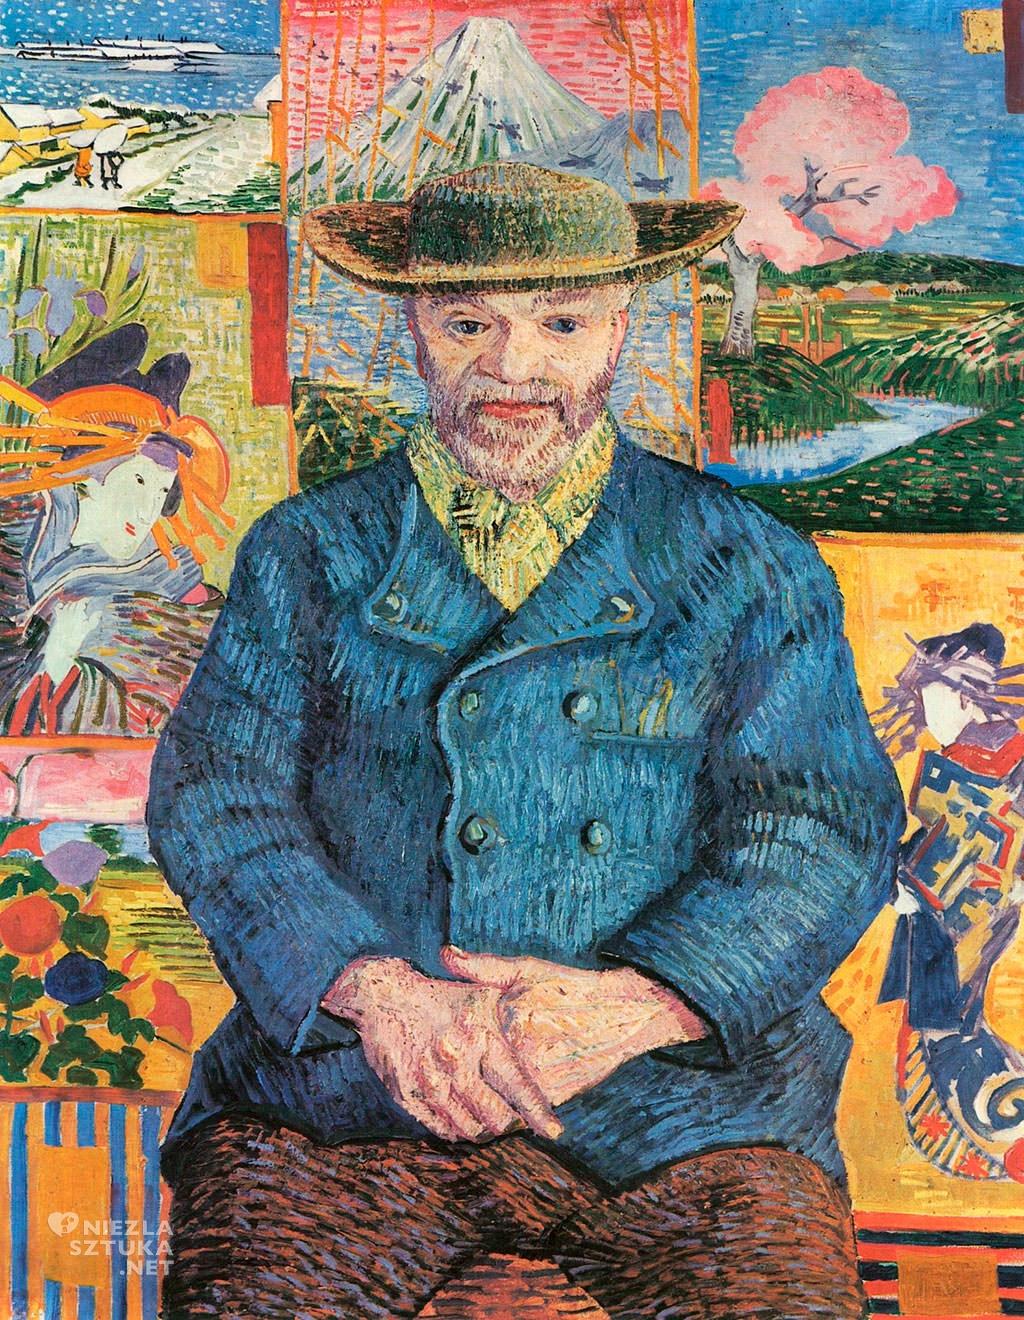 Vincent van Gogh, Portret Ojca Tanguy, malarstwo holenderskie, japonizm, Niezła Sztuka